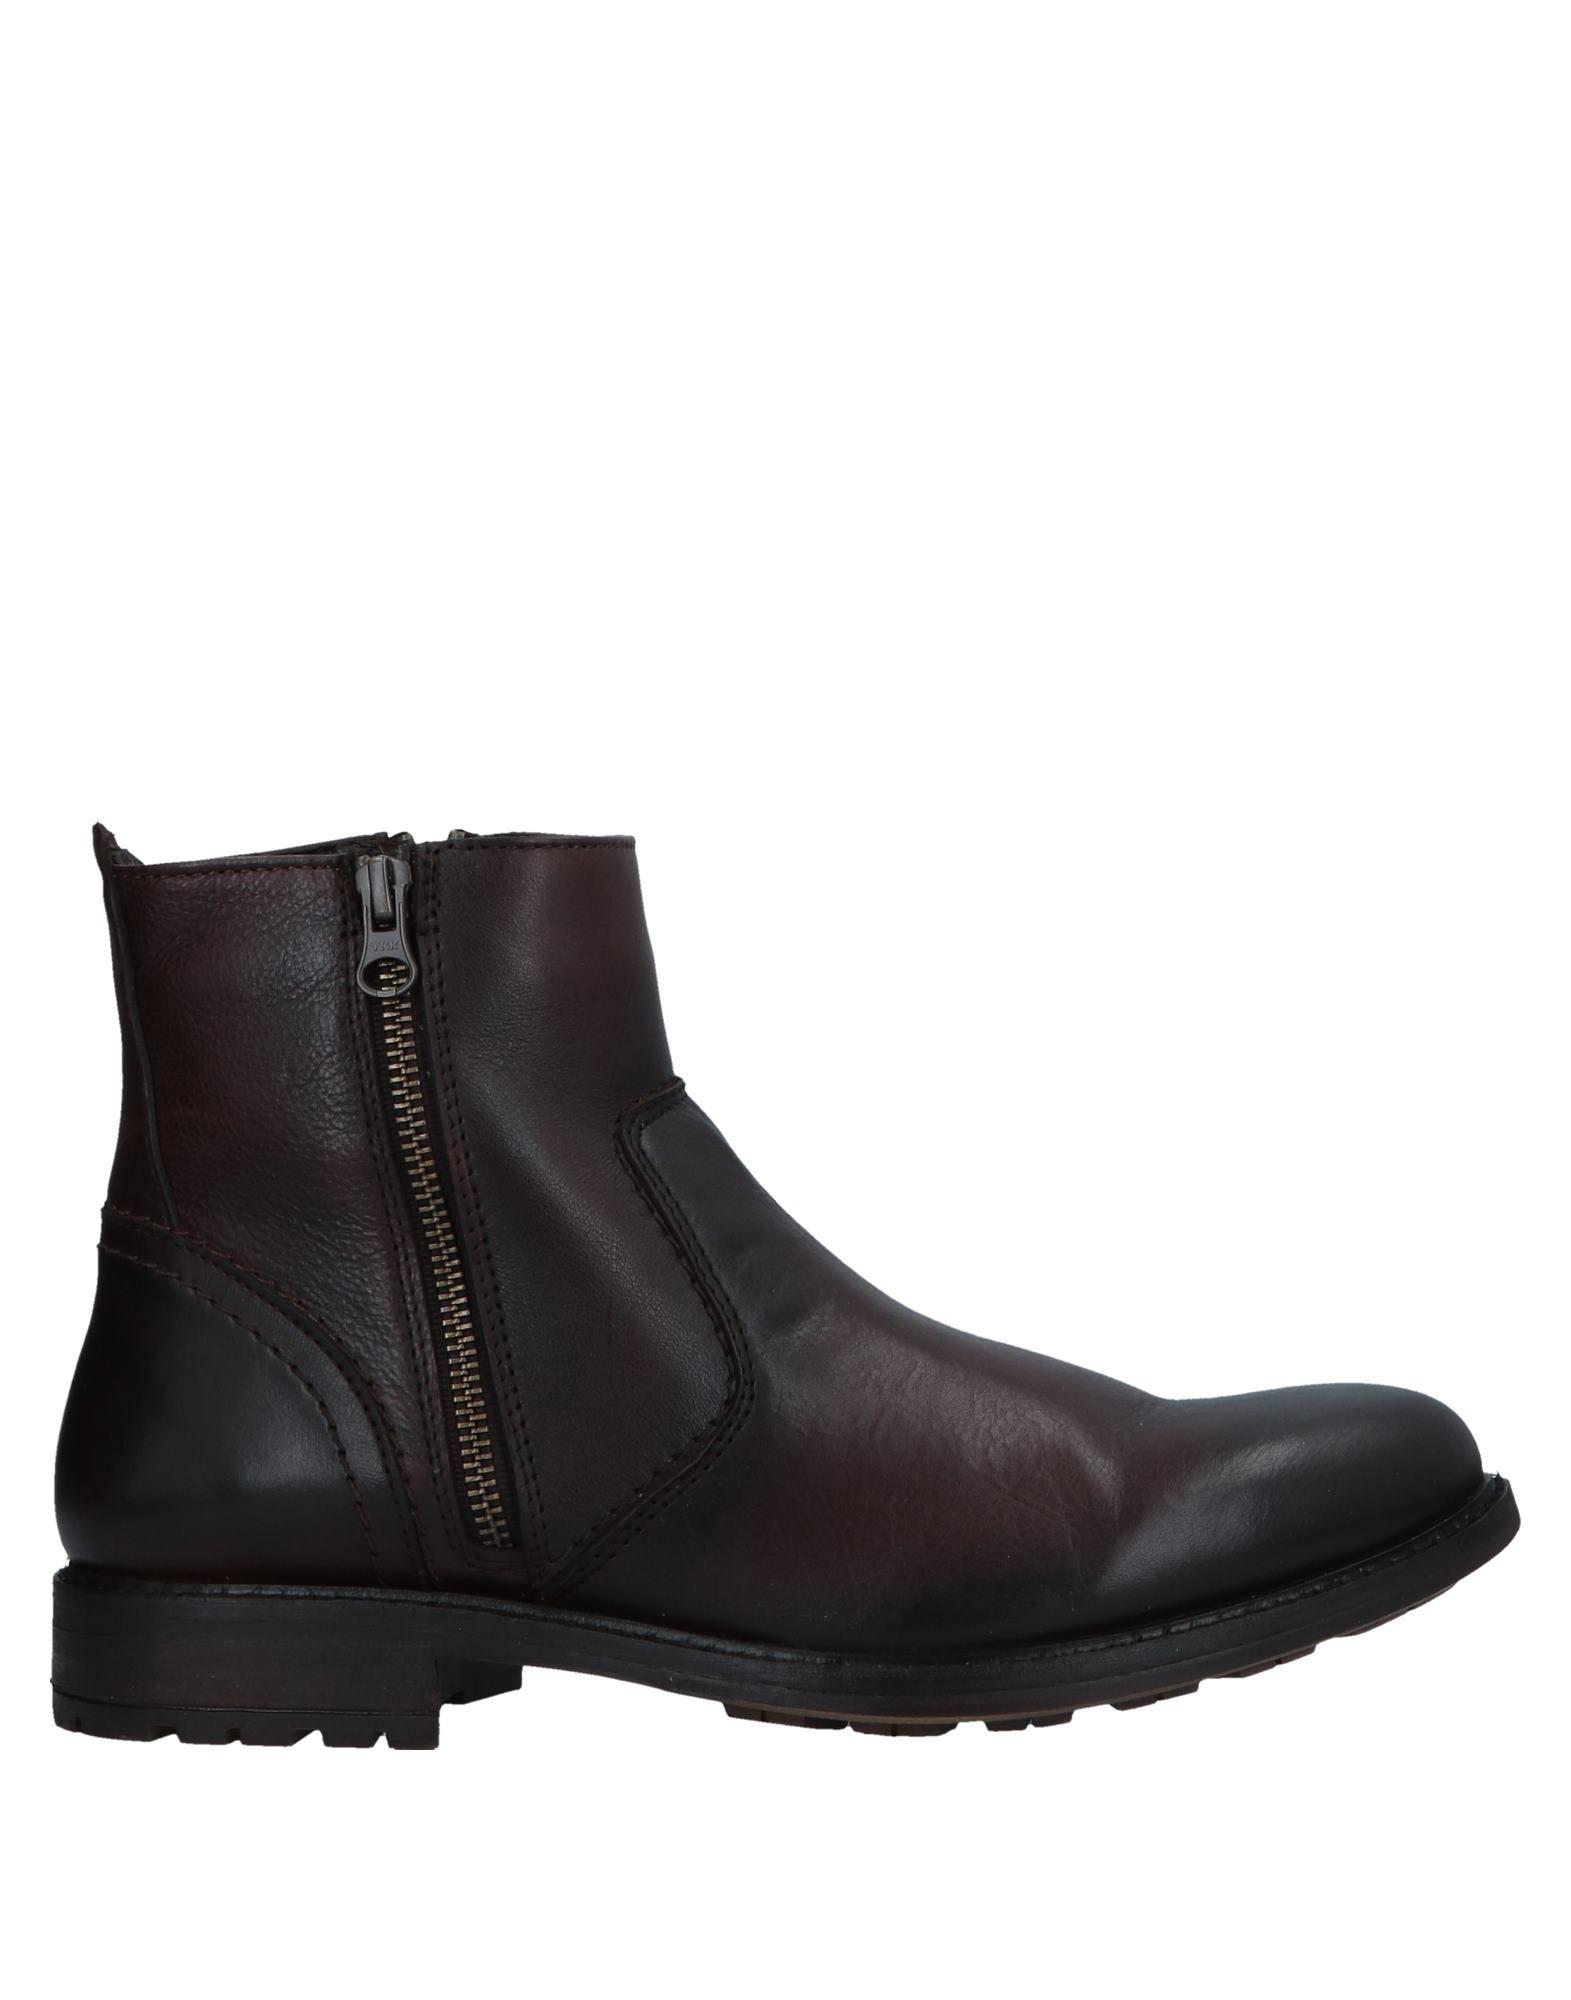 10699ccace1 Buy steve madden boots for men - Best men's steve madden boots shop ...